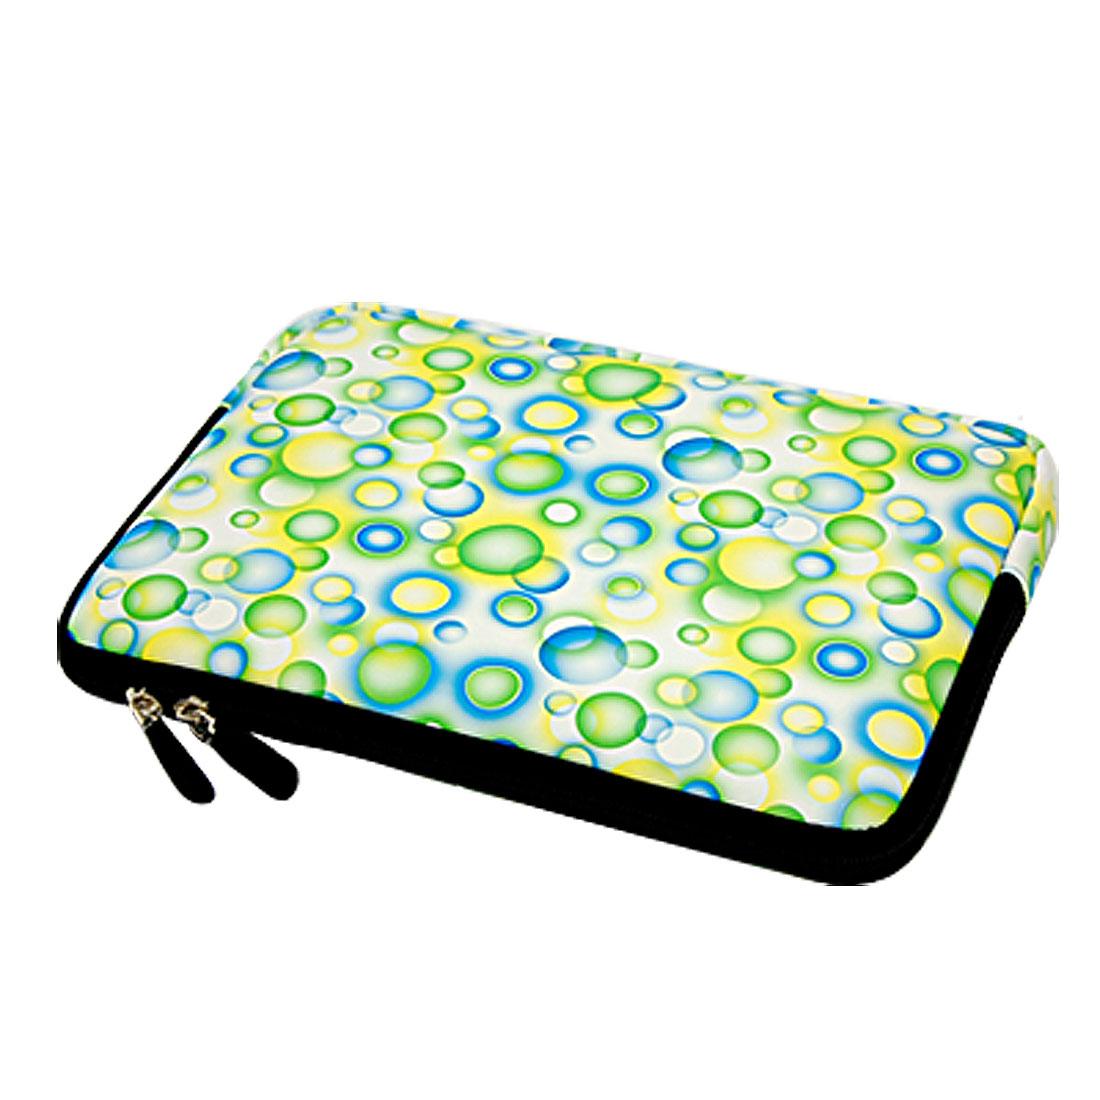 "10"" 10.1"" 10.2"" Green Blue Bubble Pattern Laptop Sleeve Bag Case Pouch"